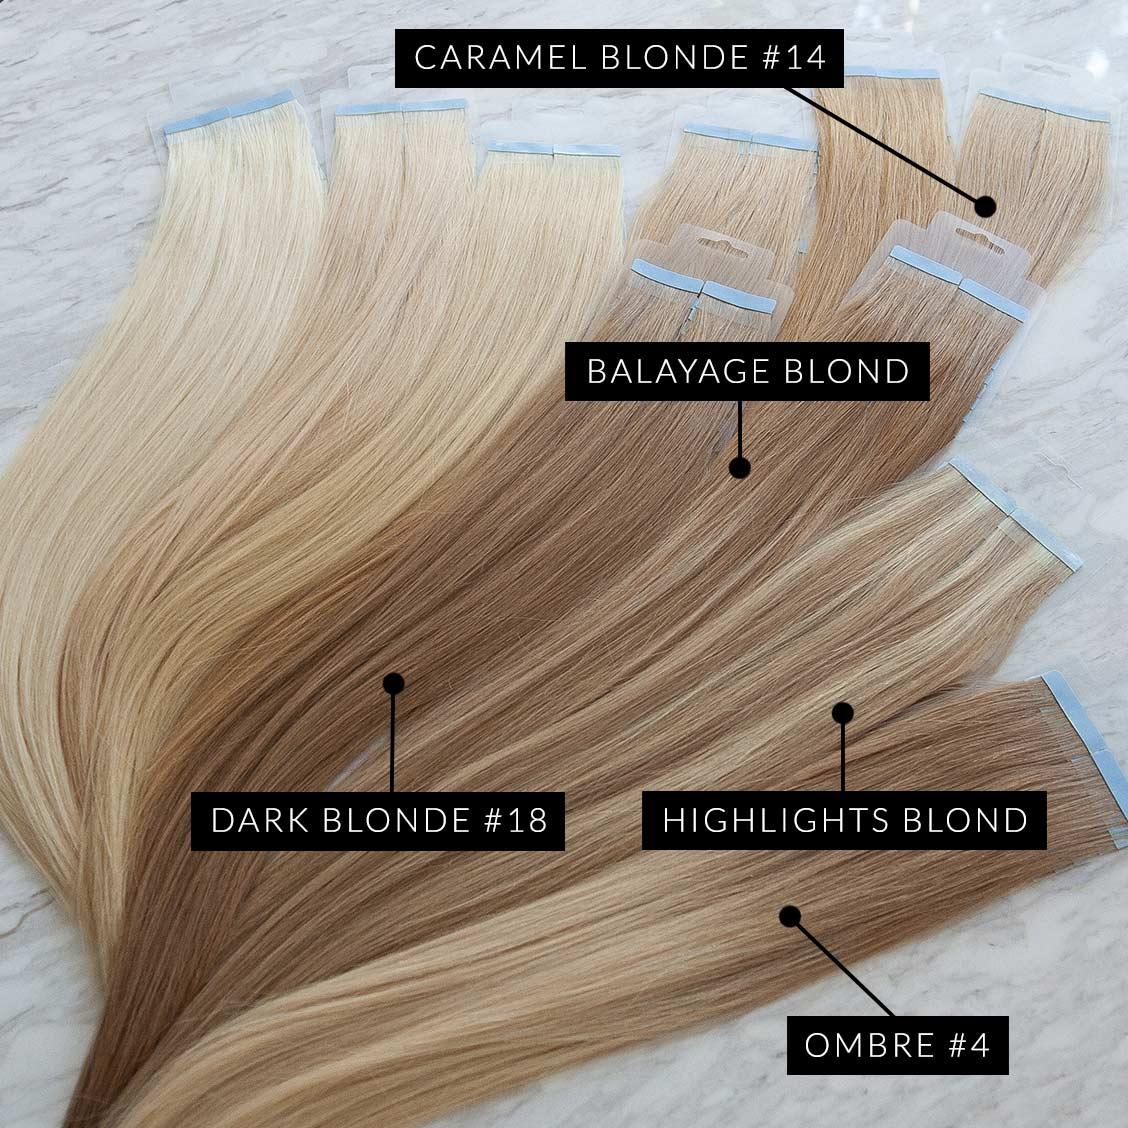 Ombre blond haarfarbe braun Ombre Blond